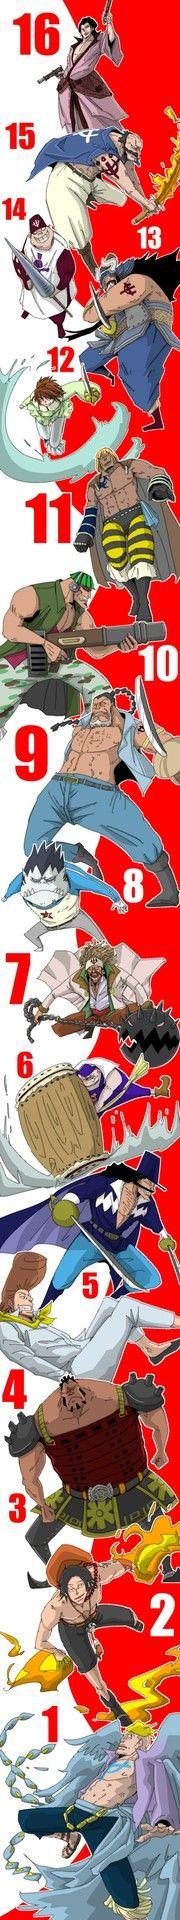 Whitebeard Pirates #OnePiece #anime